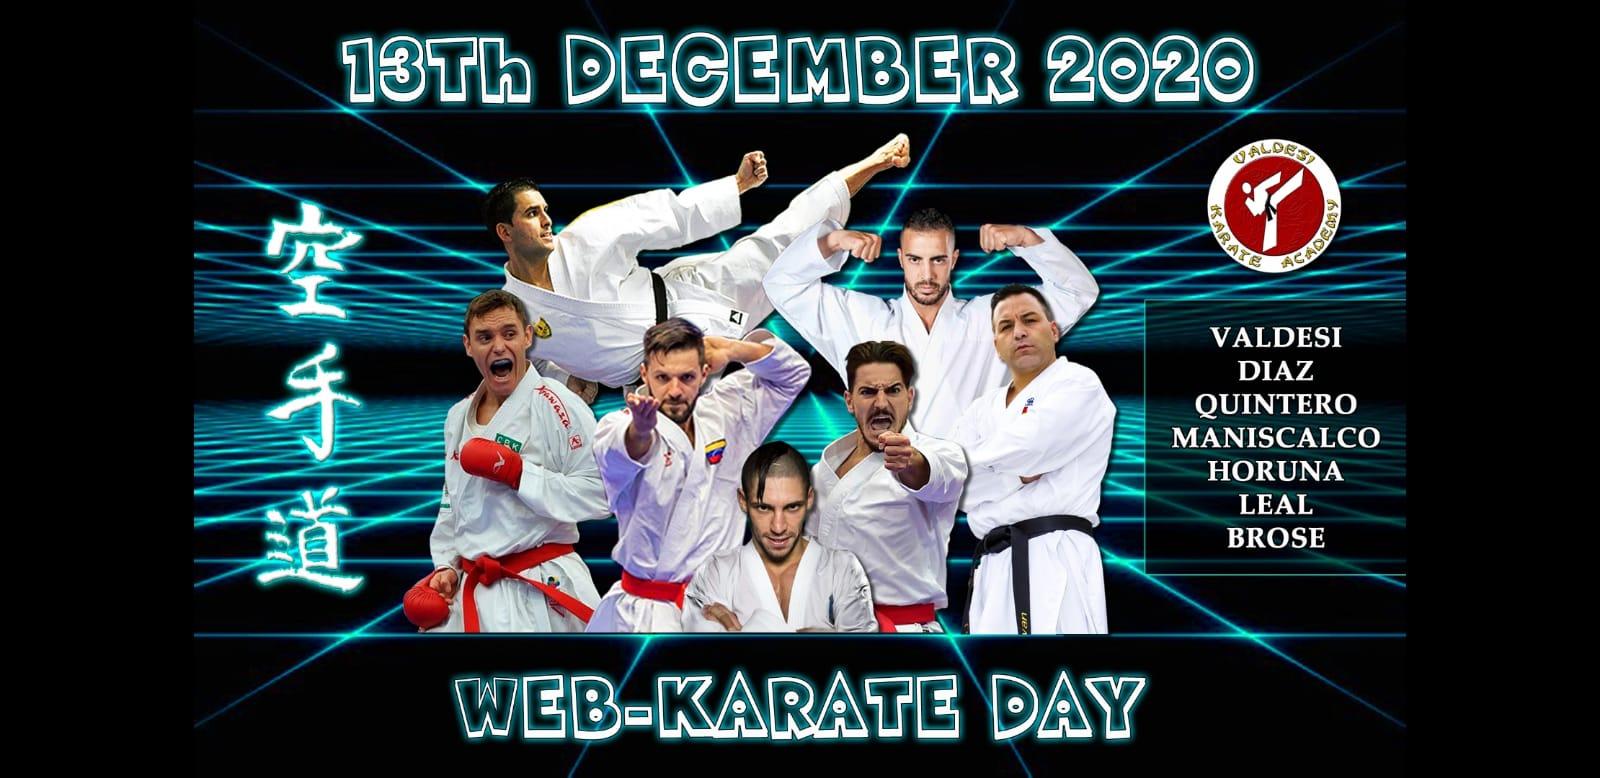 Web Karate Day - All 7 Sessions - Kata and Kumite